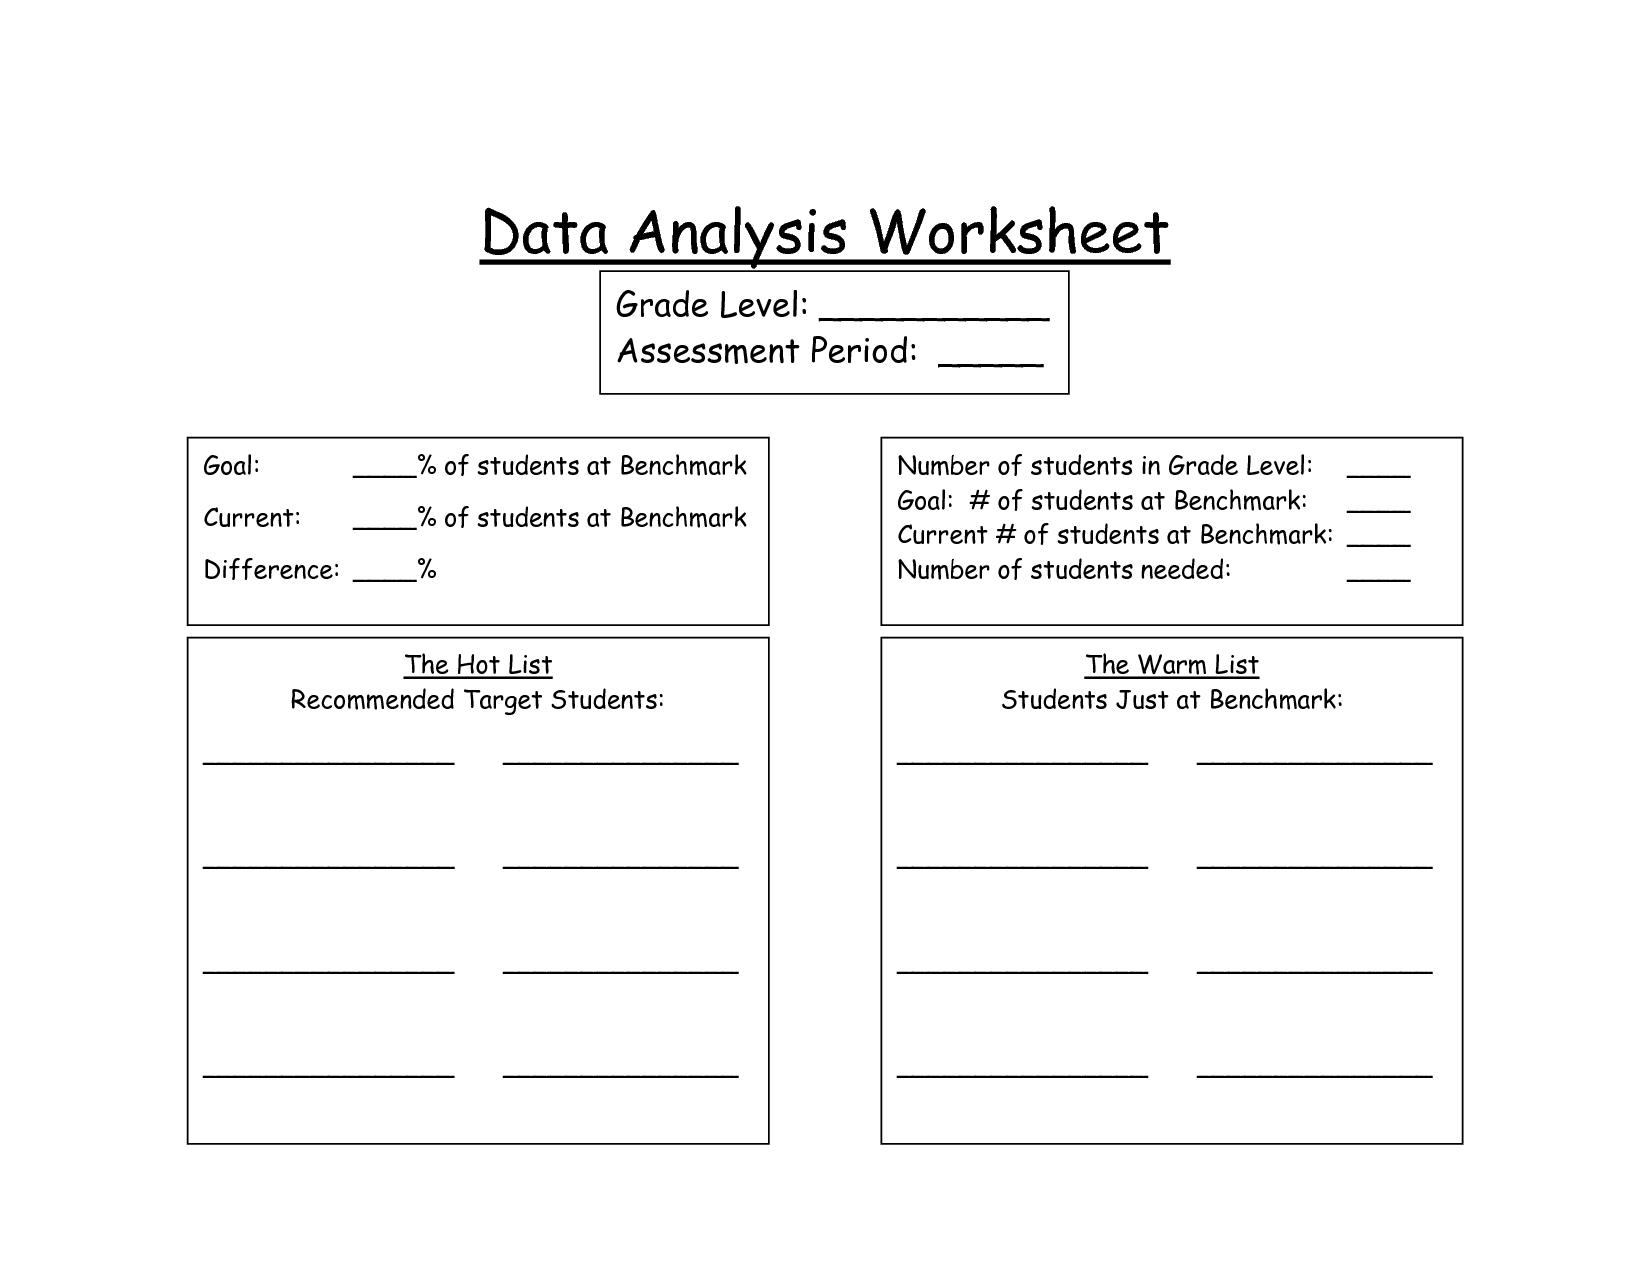 Worksheets Data Analysis Worksheets data analysis worksheet 7 worksheets biological scientific worksheet